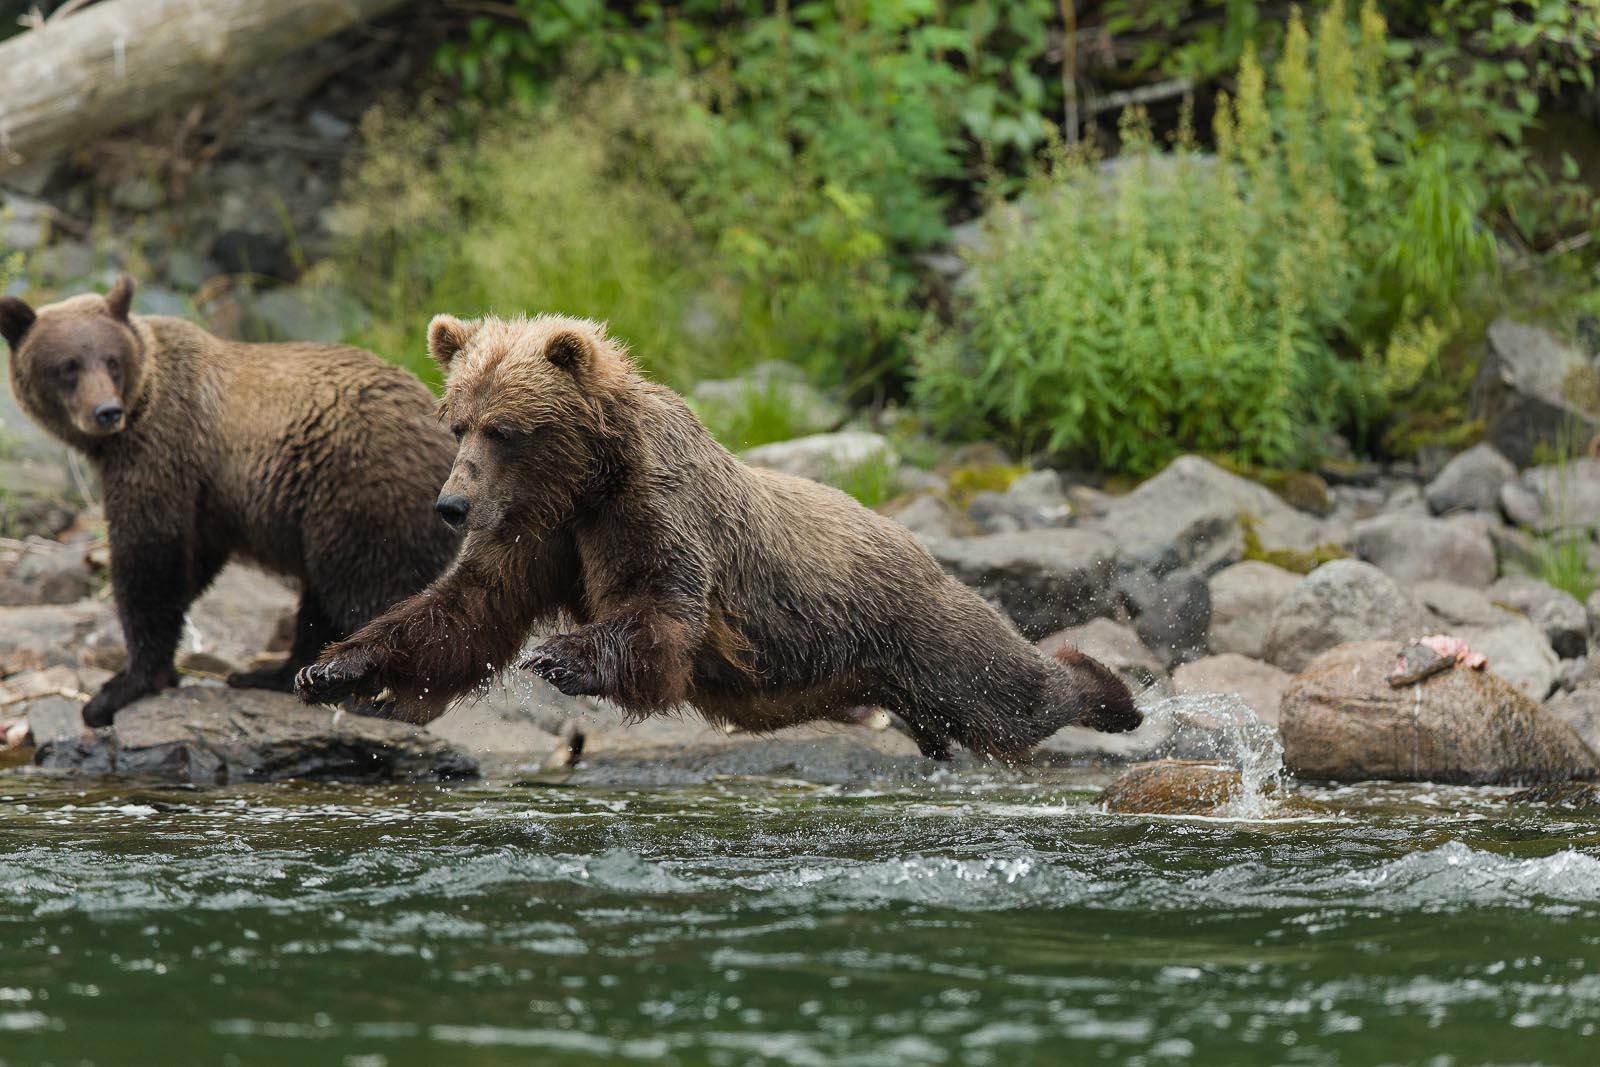 Live Niagara Falls Wallpaper Grizzly Bear Viewing At Nakina River Luxury Travel Tour